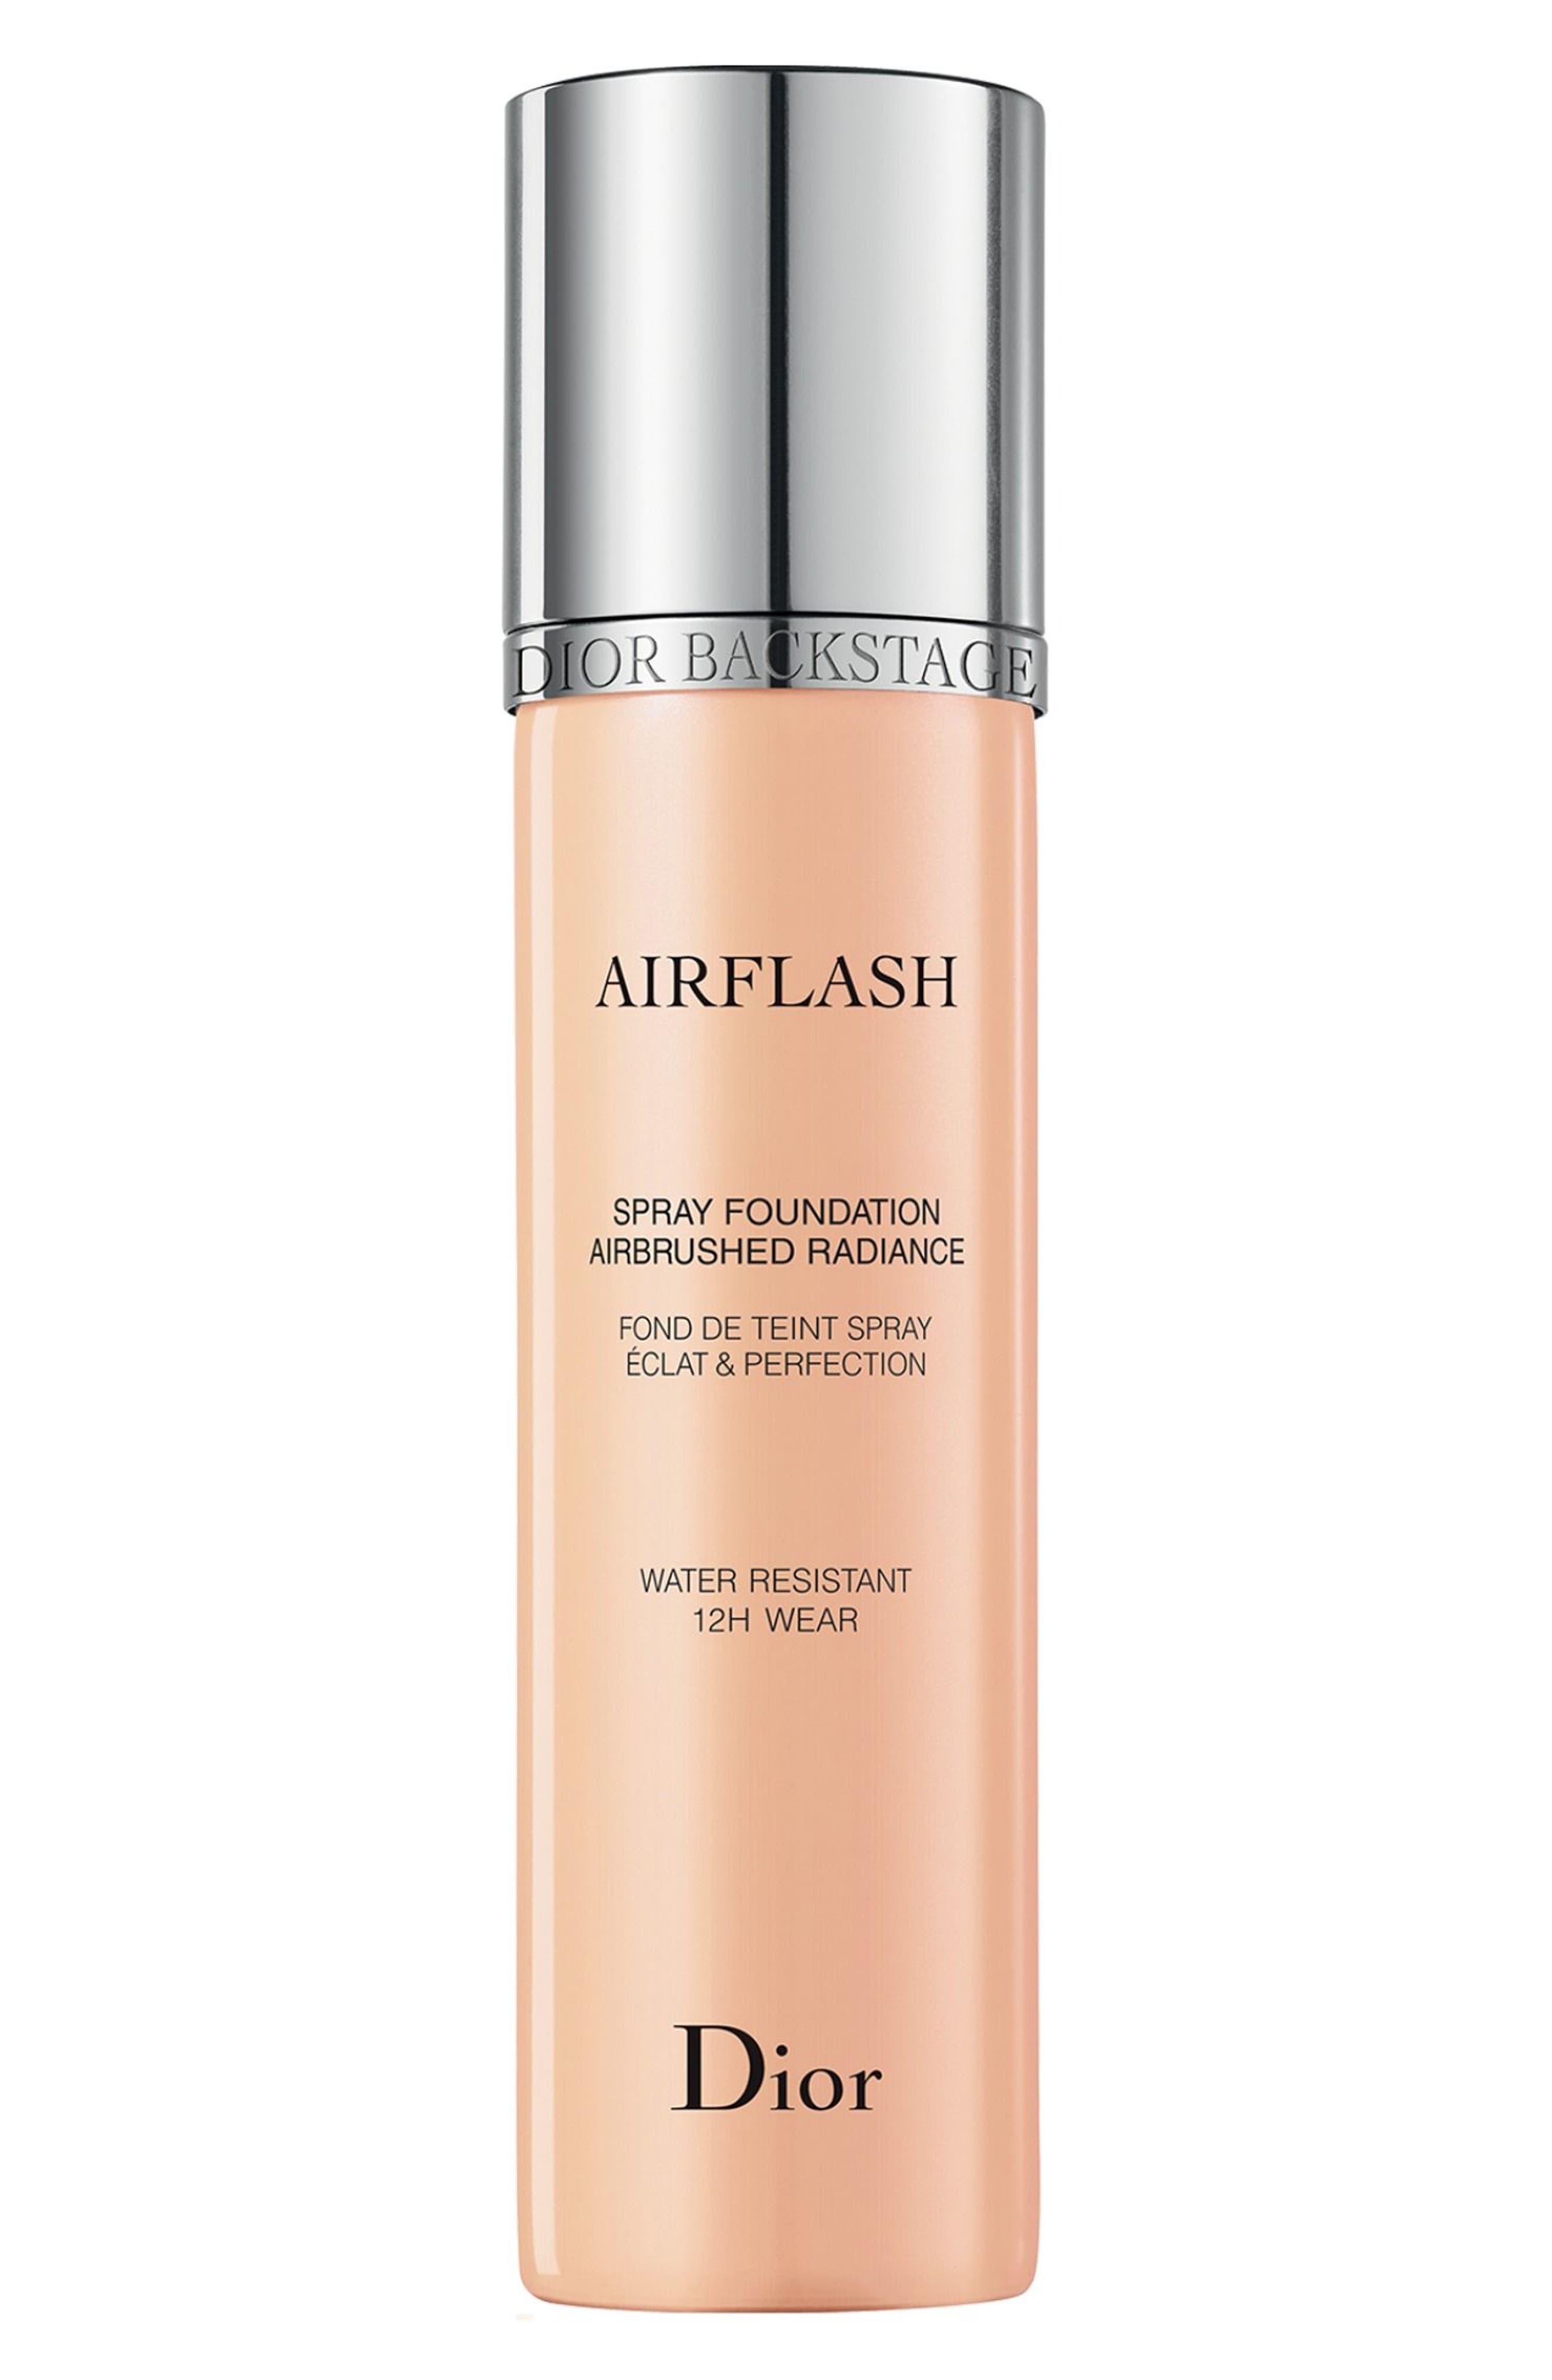 Dior Diorskin Airflash Spray Foundation - 202 Cameo